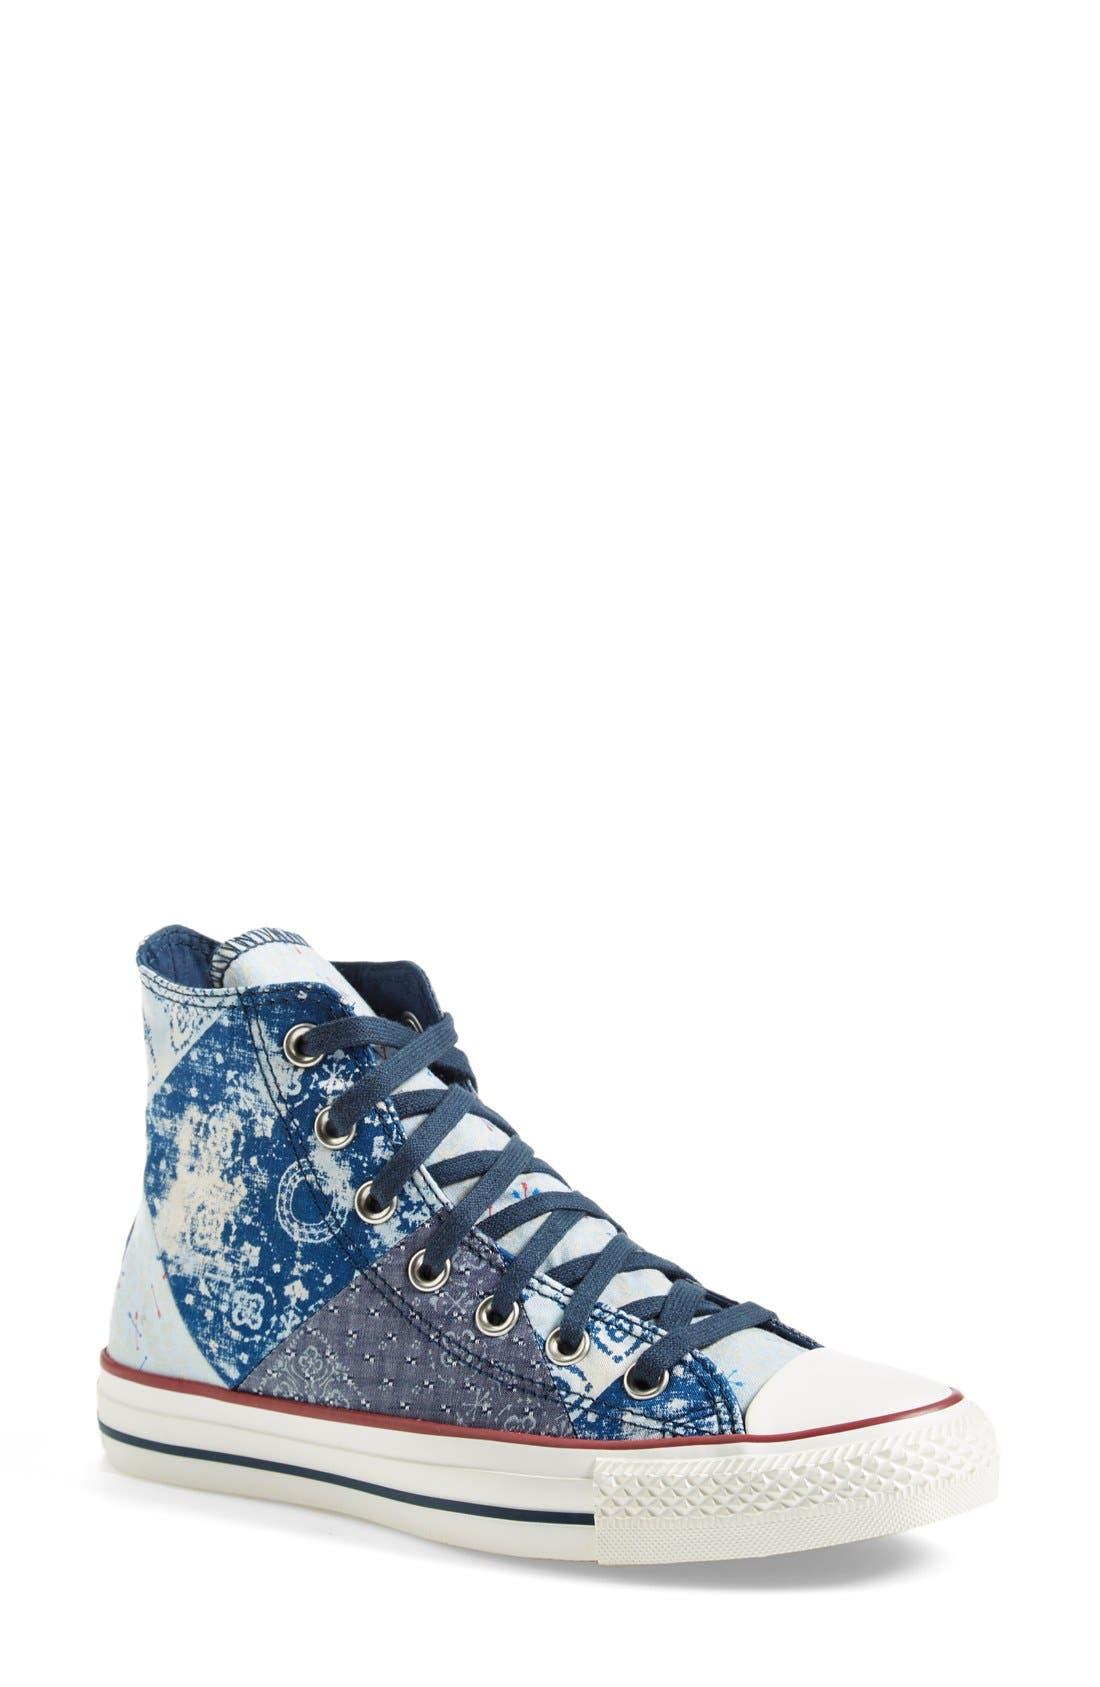 Alternate Image 1 Selected - Converse Chuck Taylor® All Star® 'Multi Bandana' High Top Sneaker (Women)